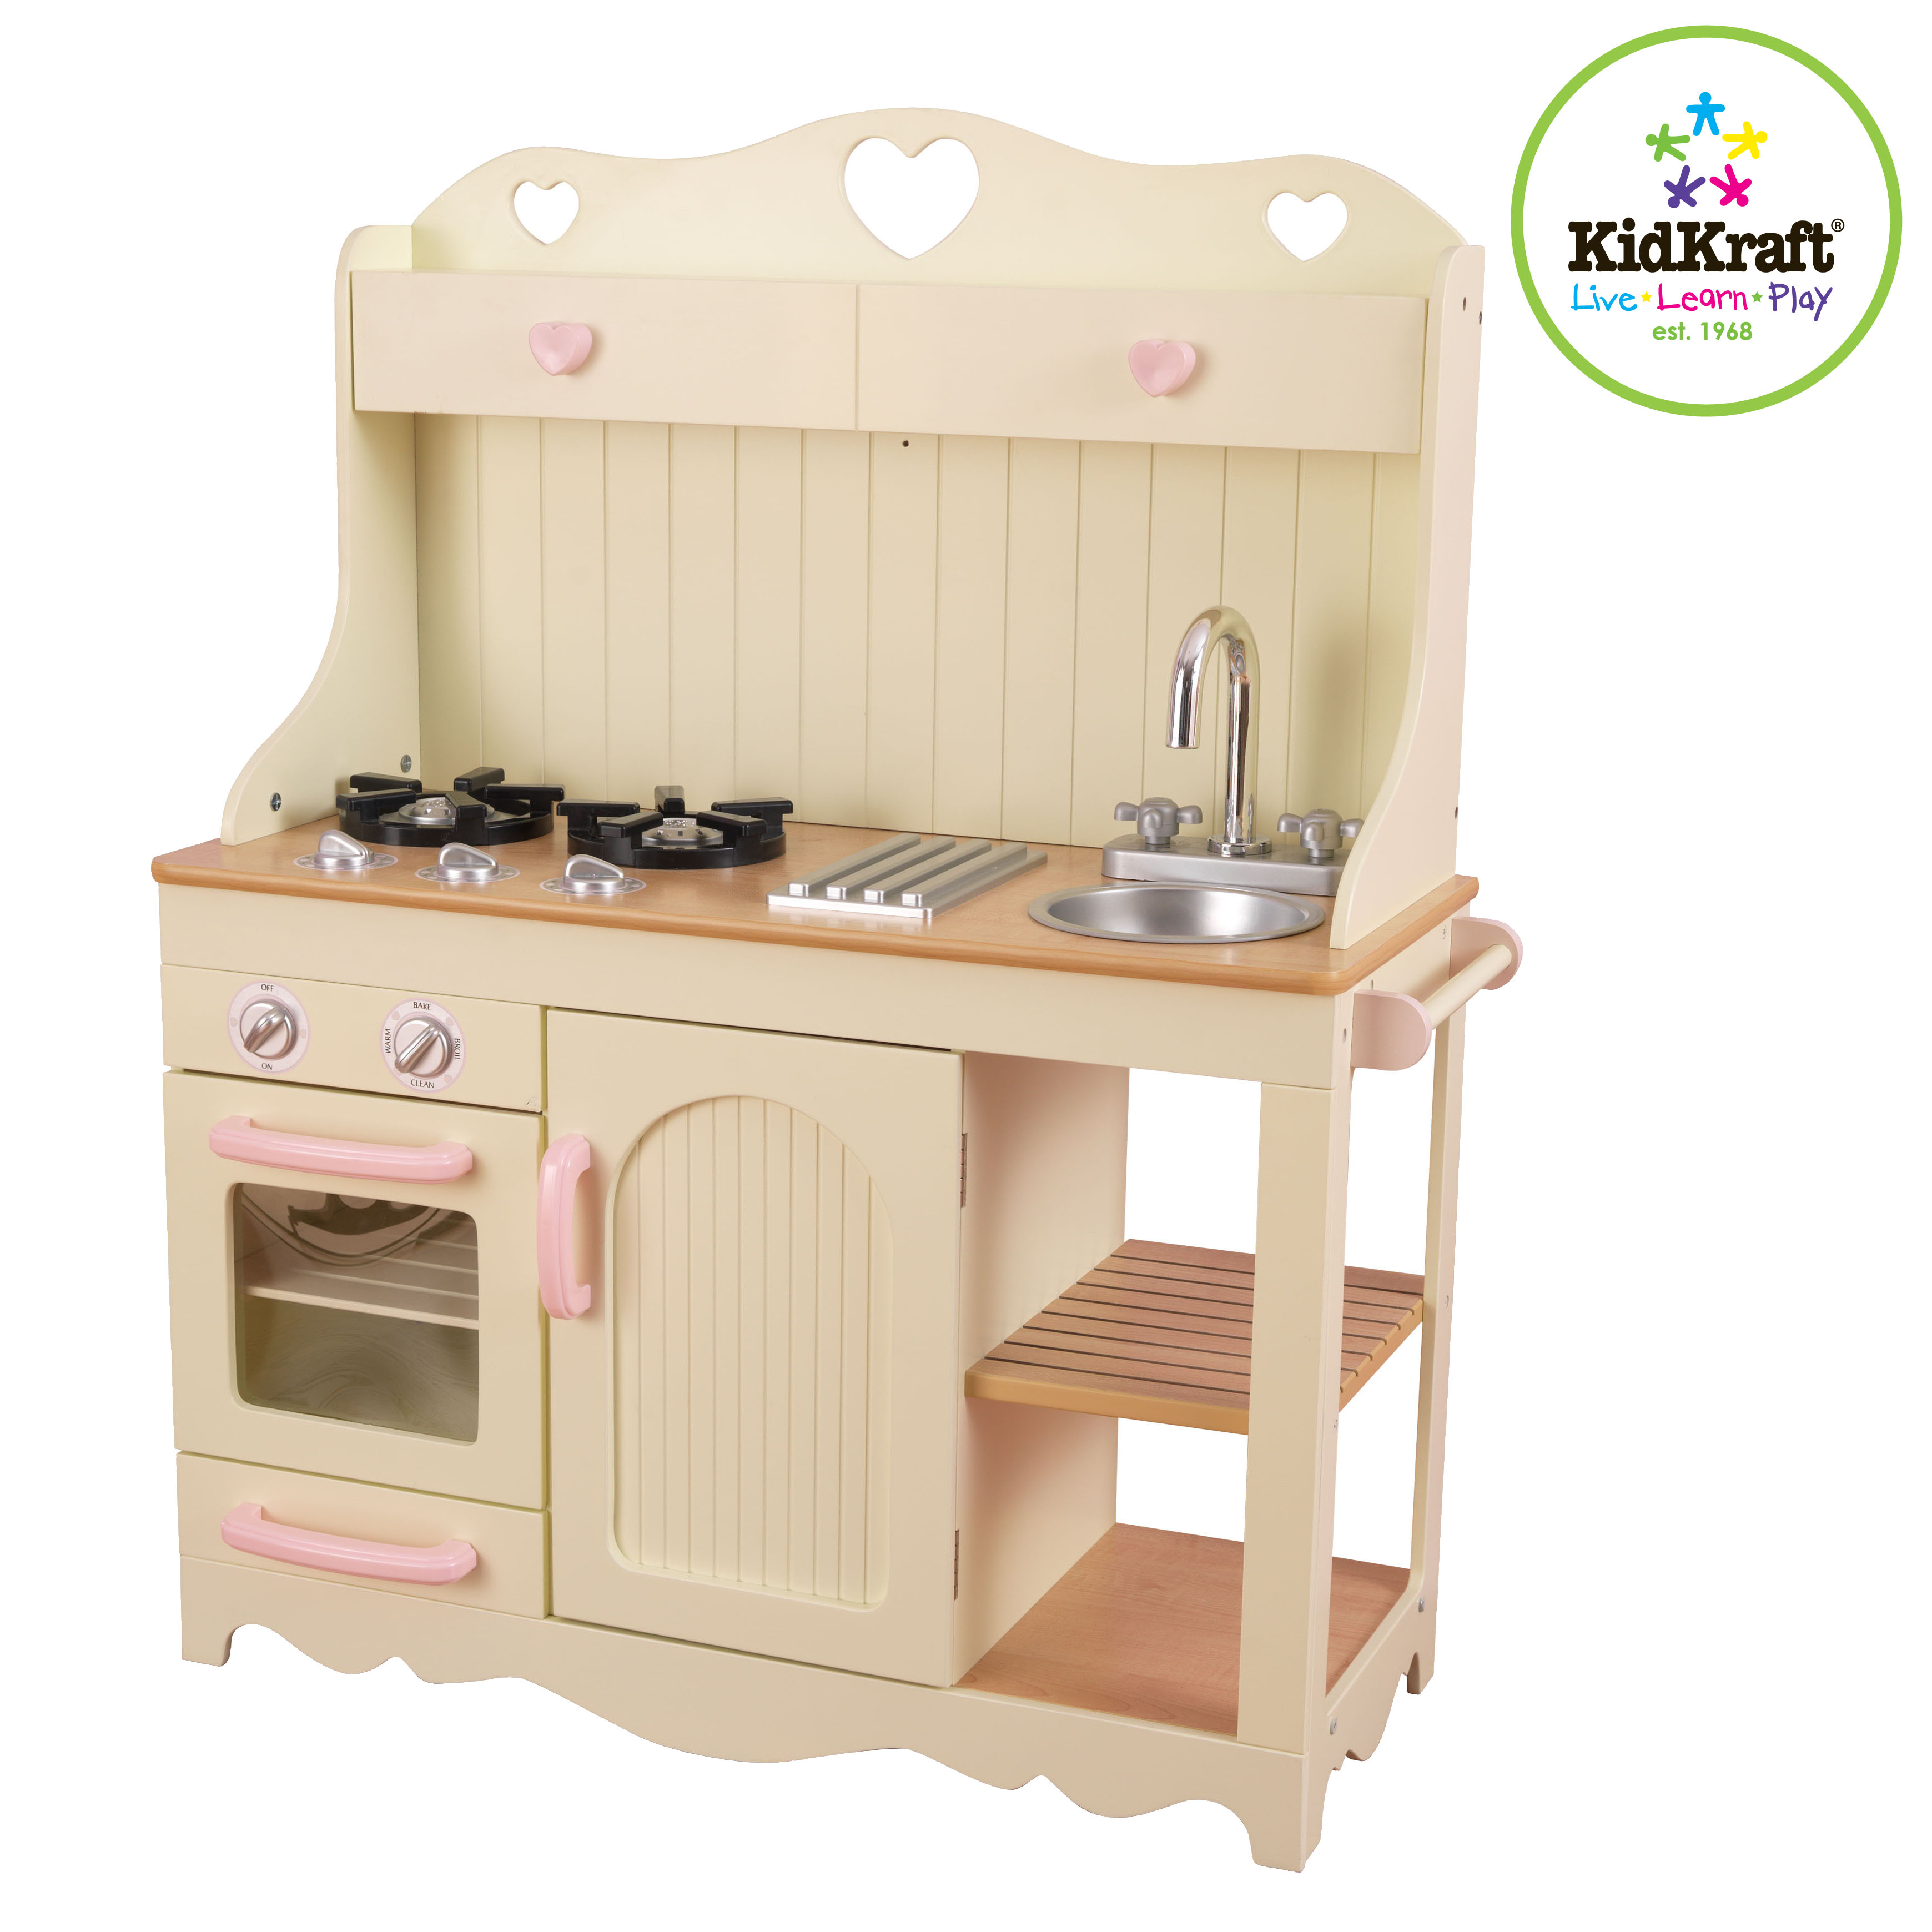 Dětská kuchyňka Prairie